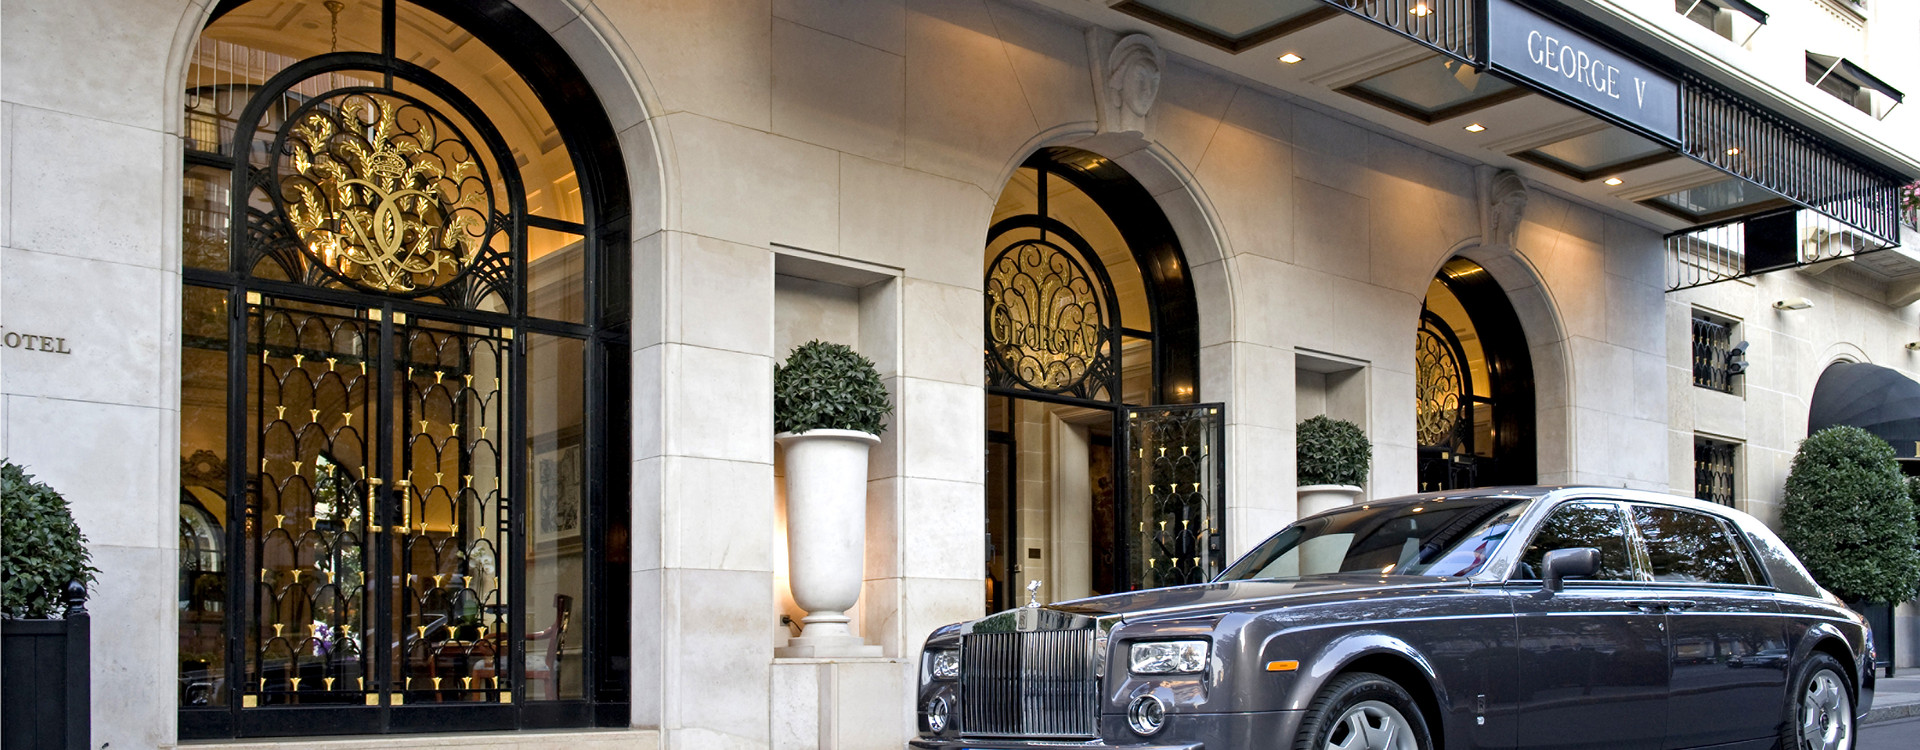 Hotel George V – Four Seasons